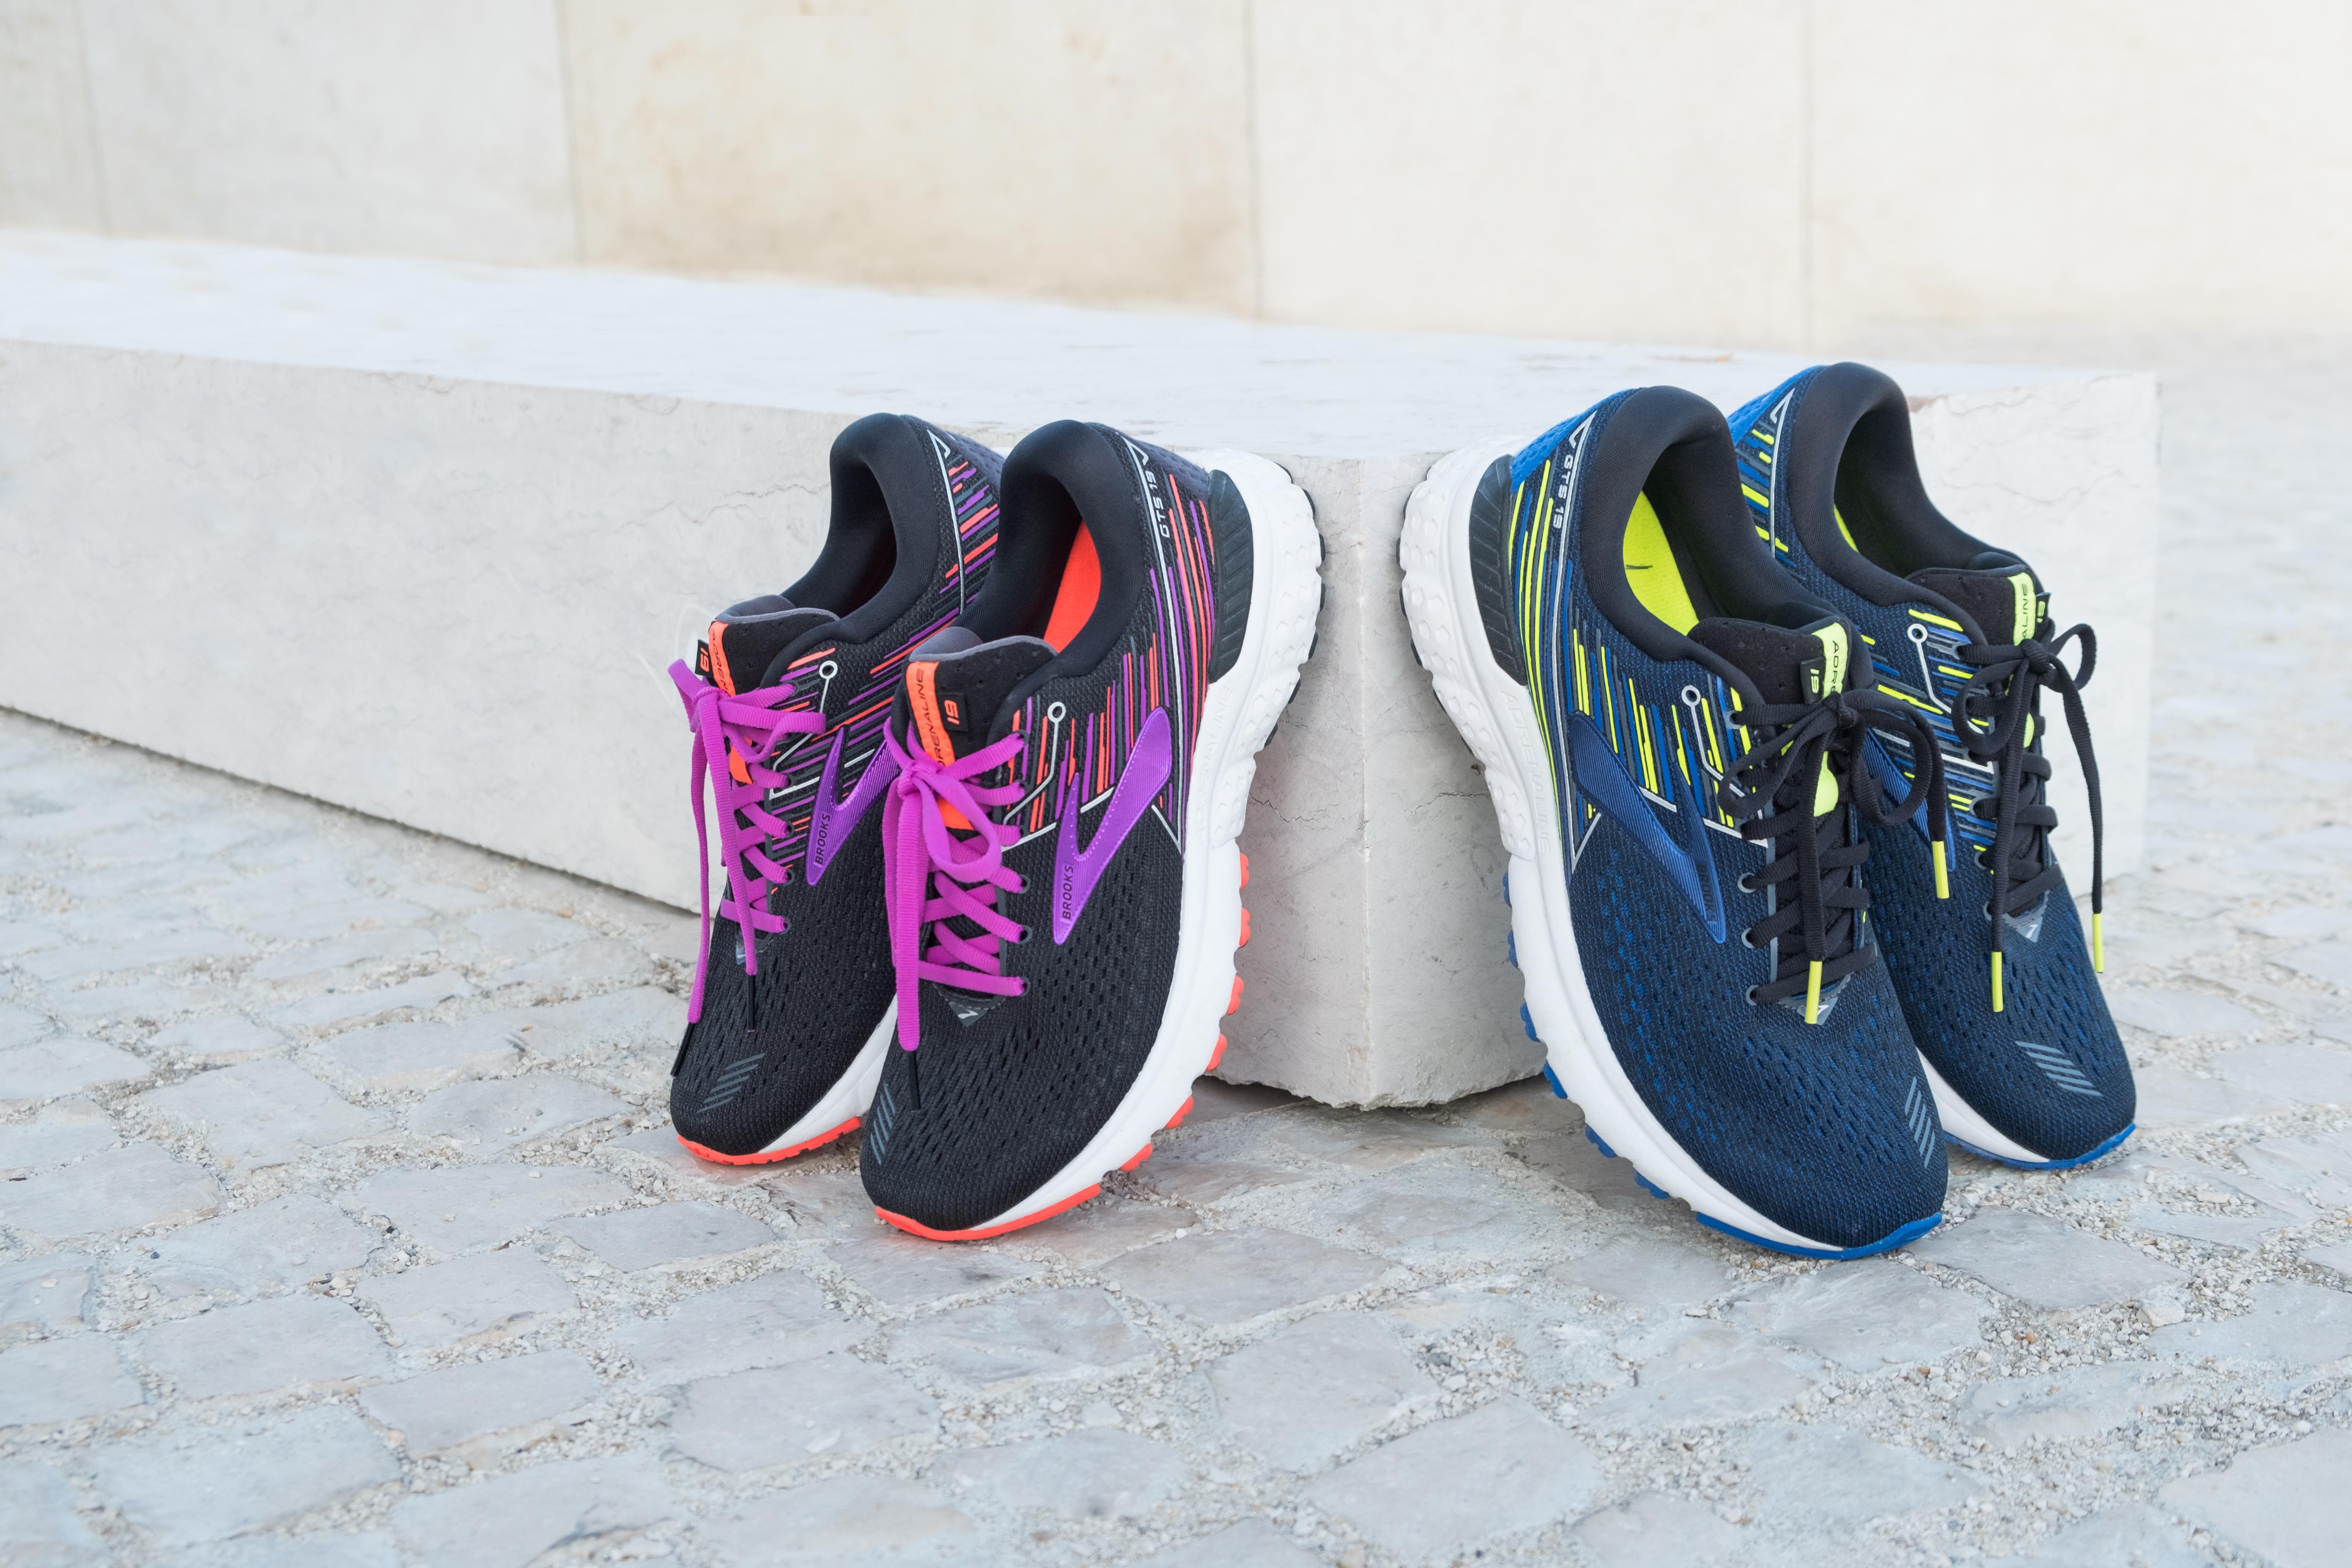 af158db05208a Retrouvez la chaussure de running BROOKS ADRENALINE GTS 19 sur i-Run.fr   BROOKS  ADRENALINE GTS 19